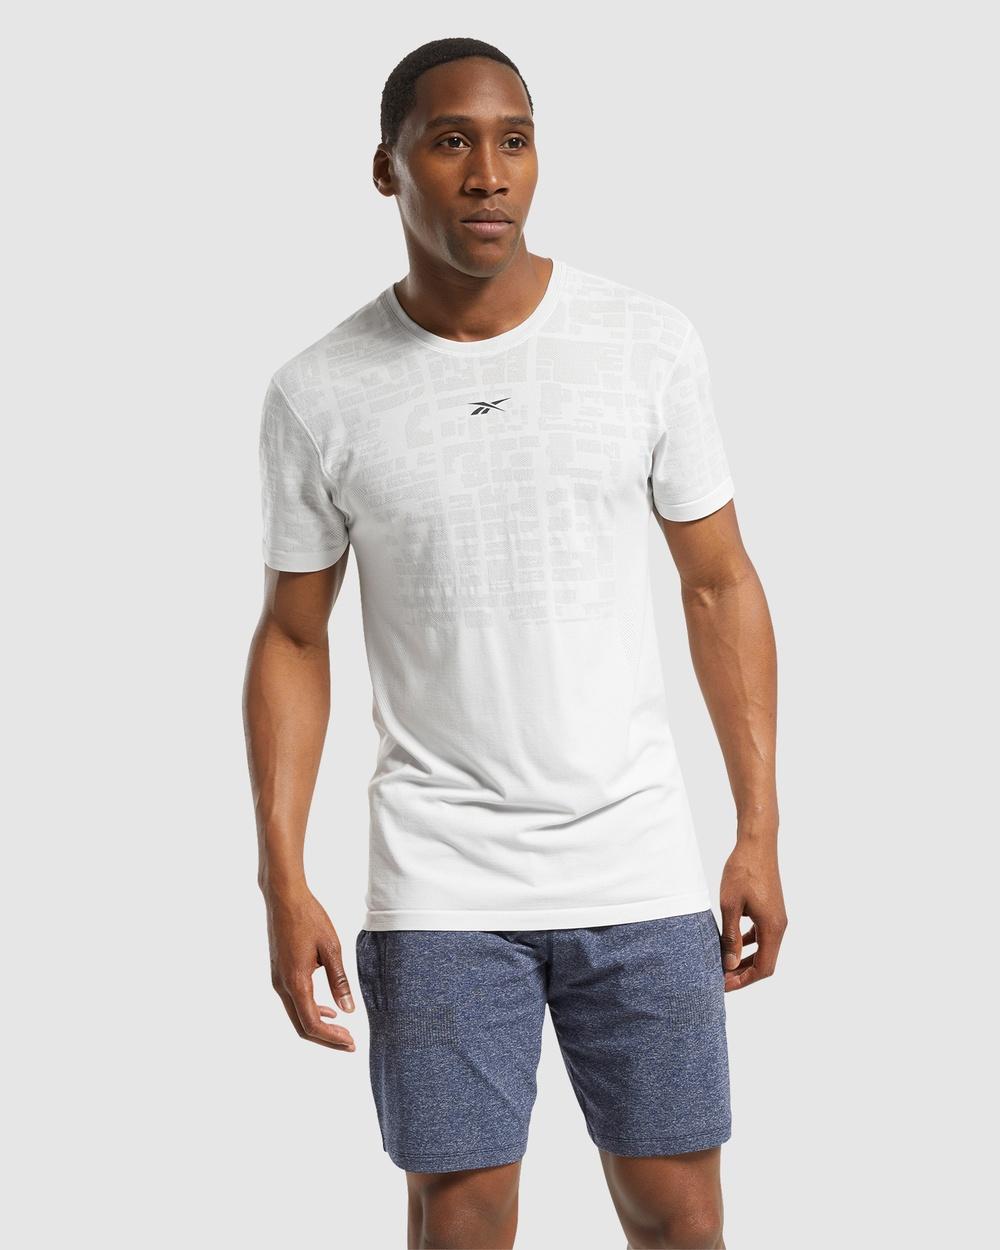 Reebok Performance - United By Fitness MyoKnit Tee - Long Sleeve T-Shirts (Blue) United By Fitness MyoKnit Tee